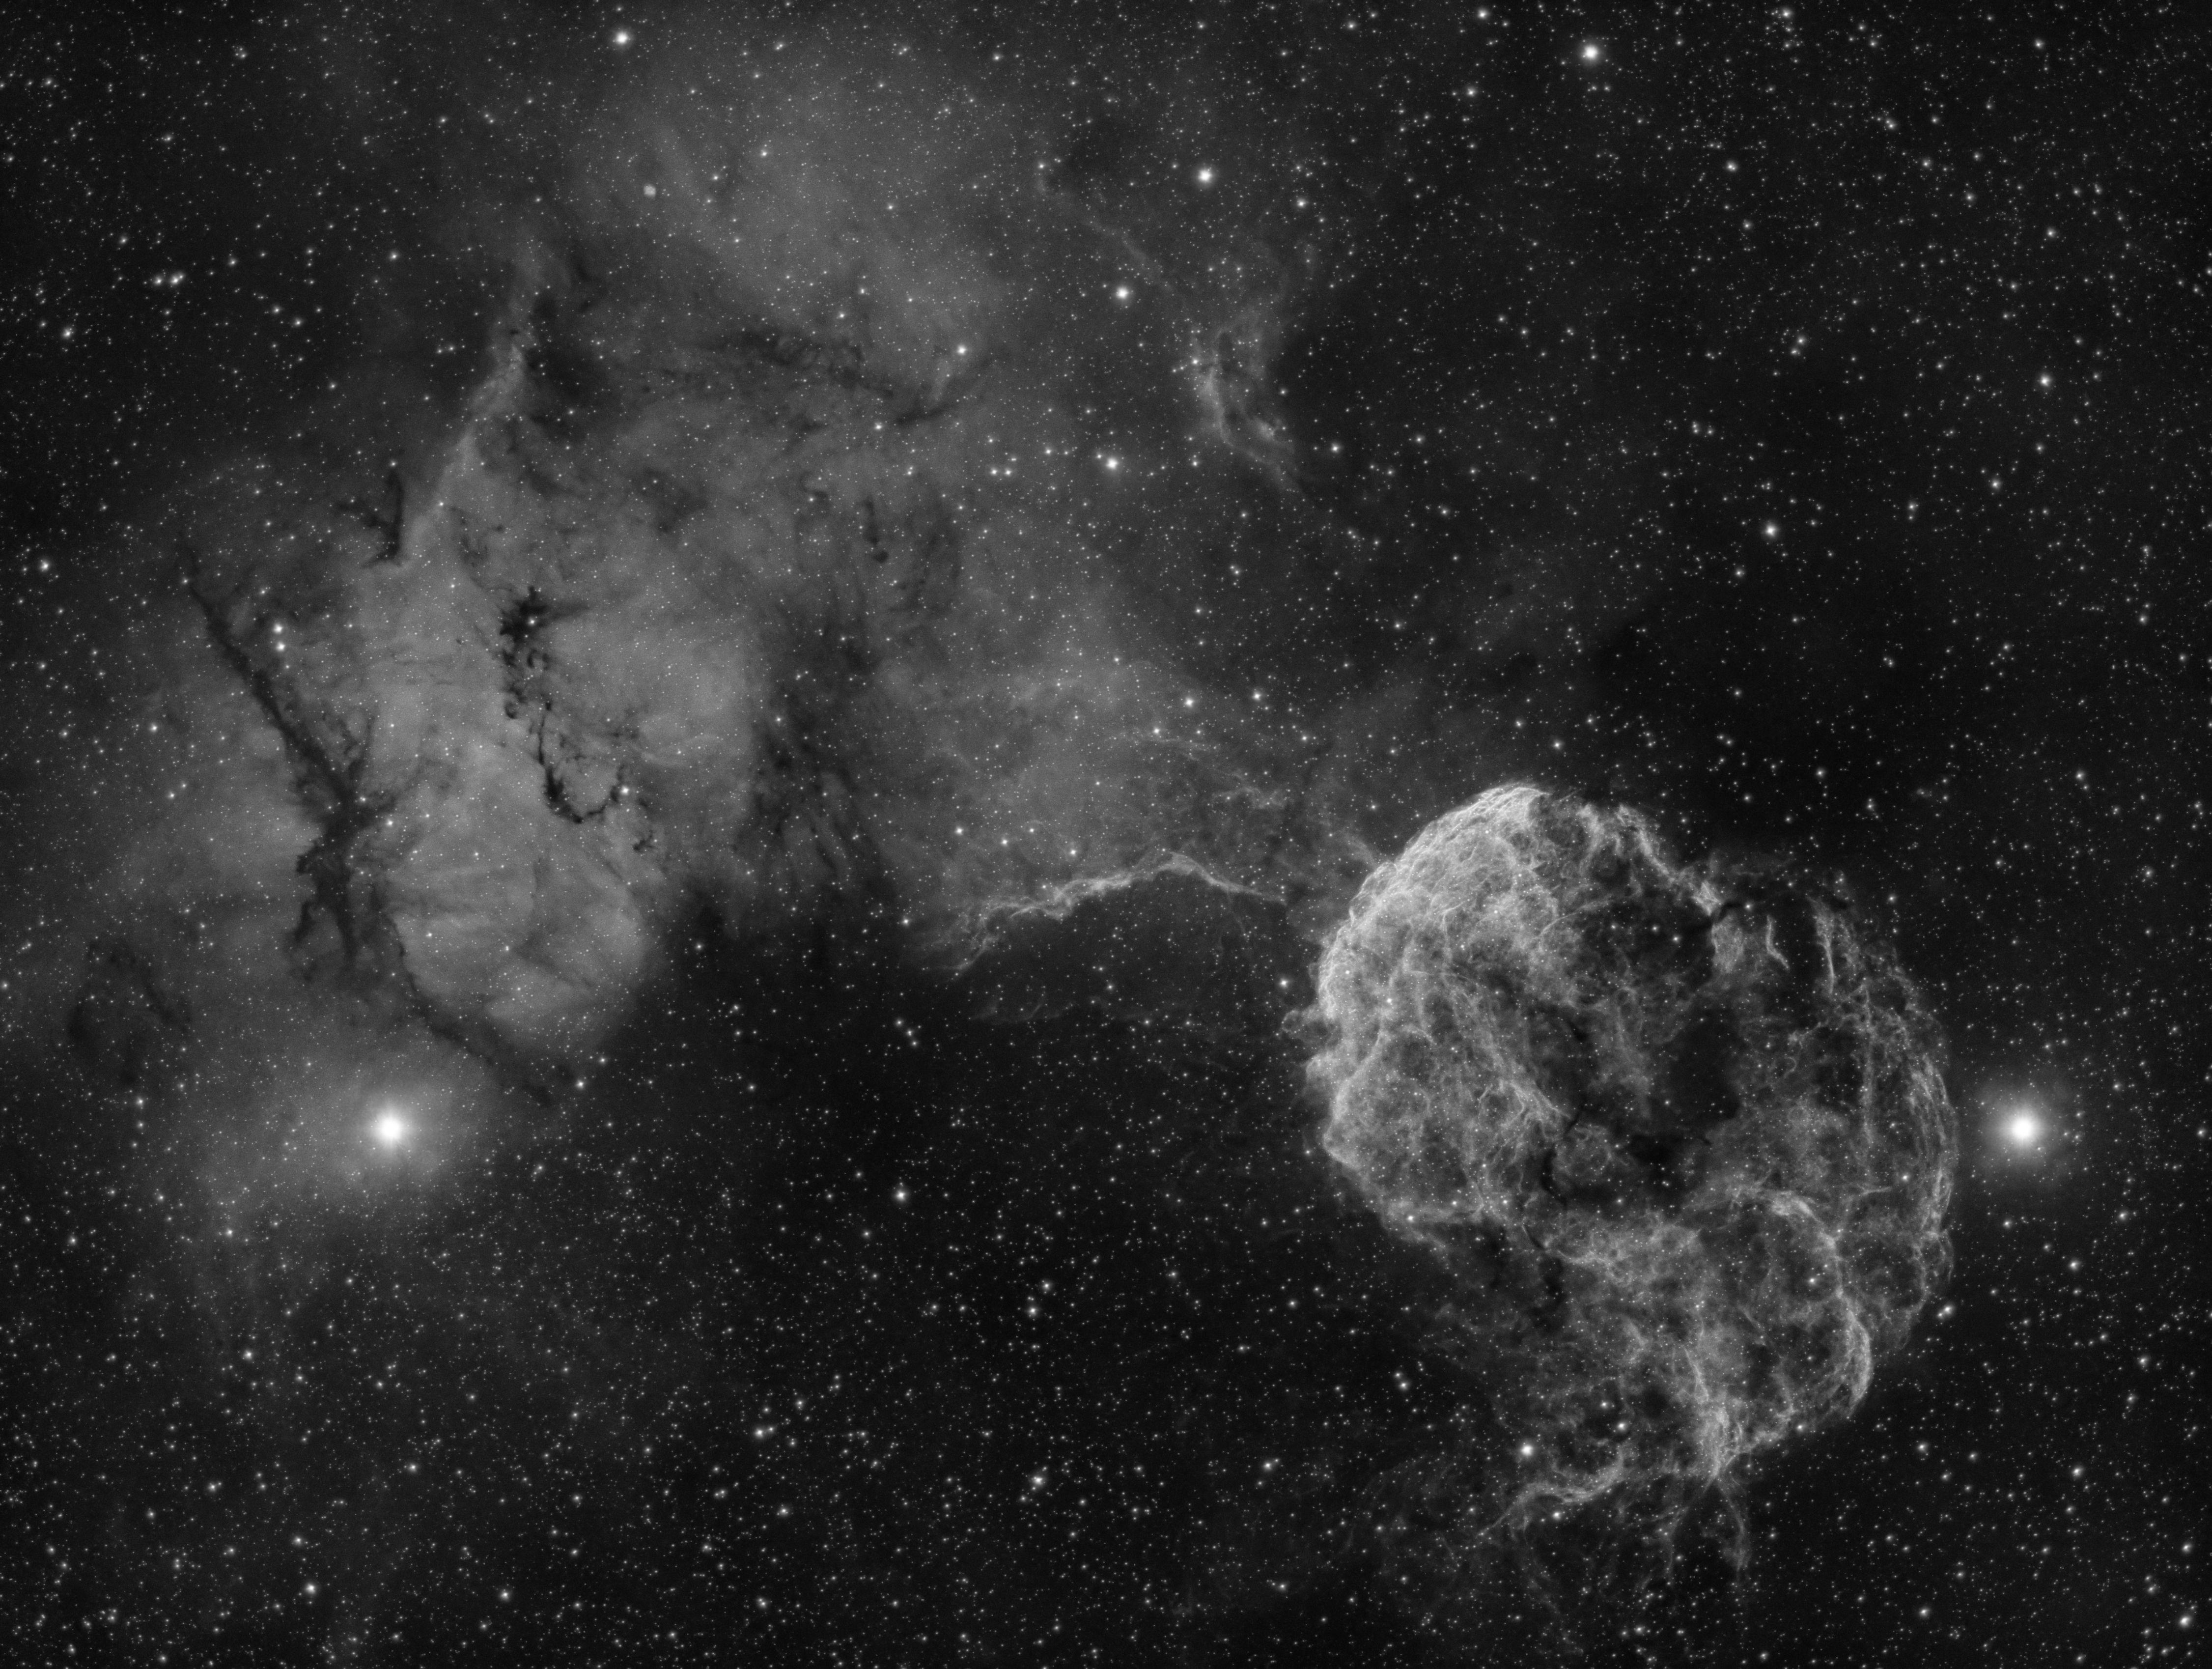 The Jellyfish Nebula (IC443) imaged in Hydrogen-alpha